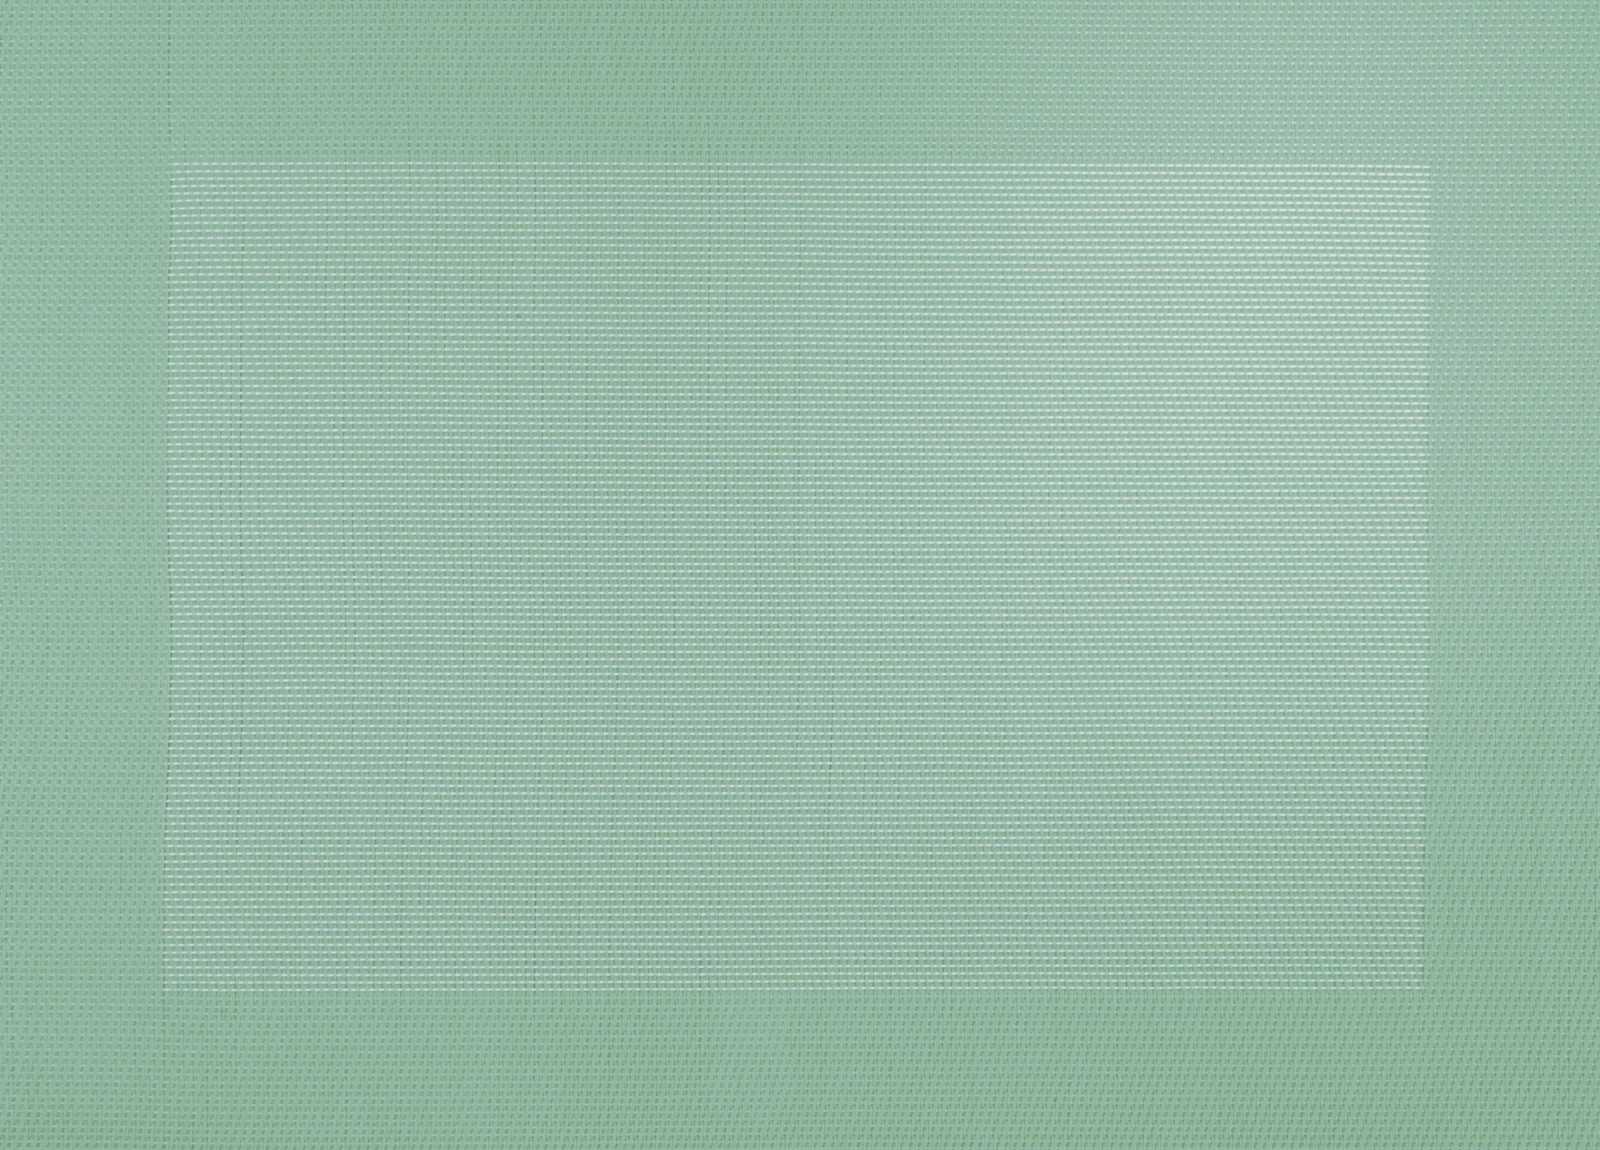 Онлайн каталог PROMENU: Подставка под тарелку ASA Selection PVC PLACEMATS, размеры  46х33 см, зеленый ASA Selection 78106076